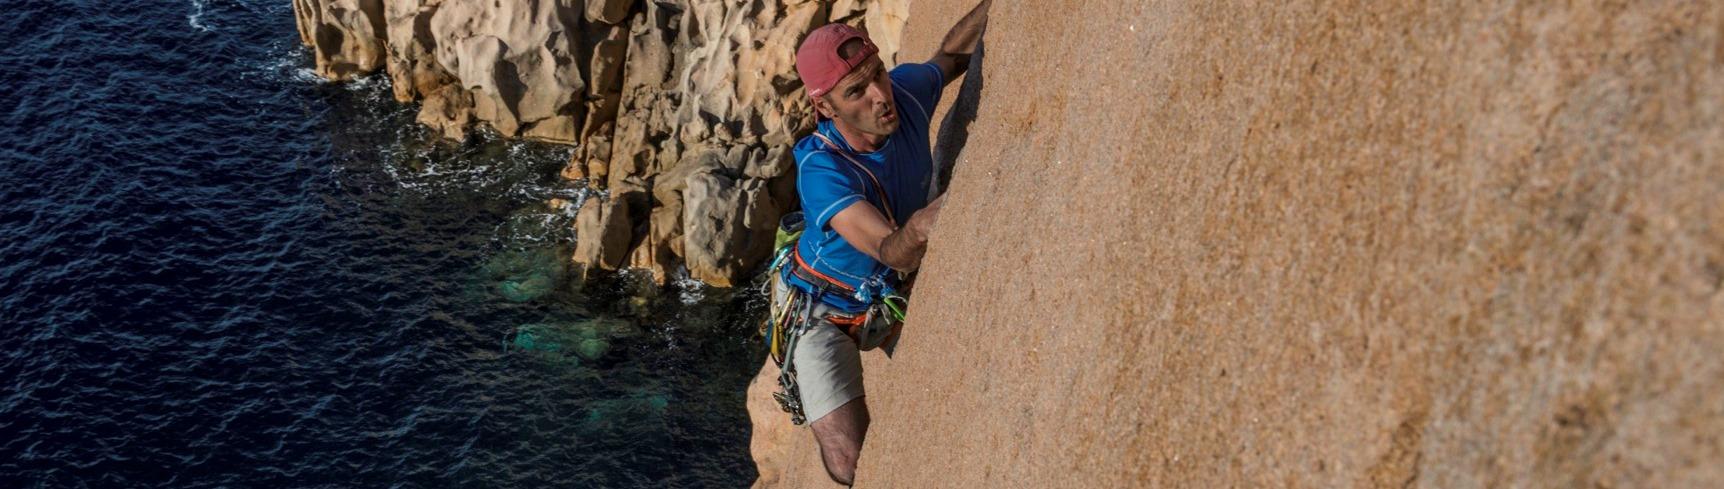 L'escalade en Corse dans la région de Porto